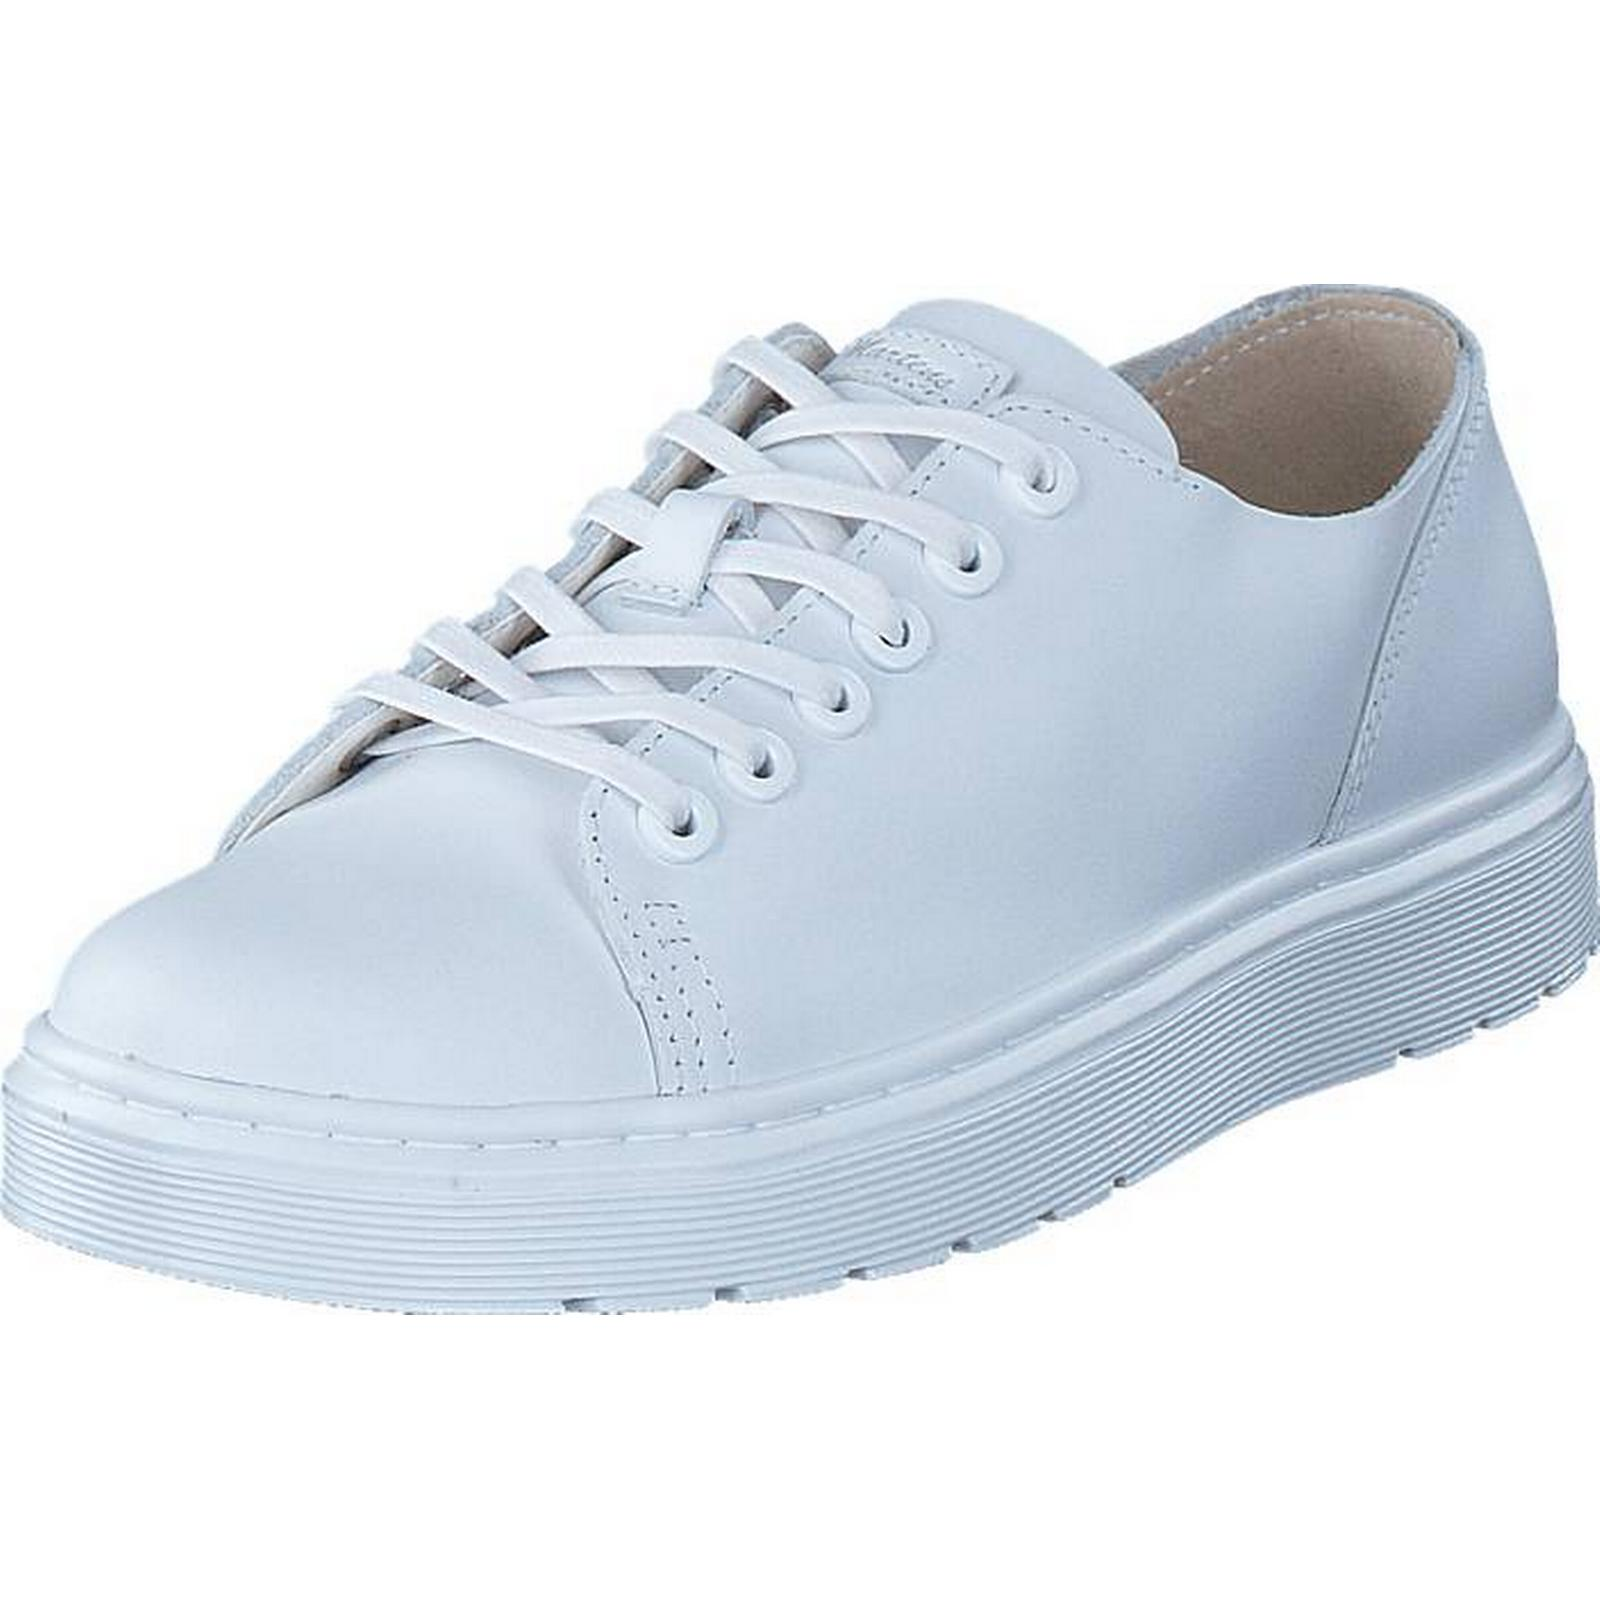 Dr Martens Dante White, White, Dante Shoes, Flats, Casual Shoes, White, Unisex, 36 45edf1